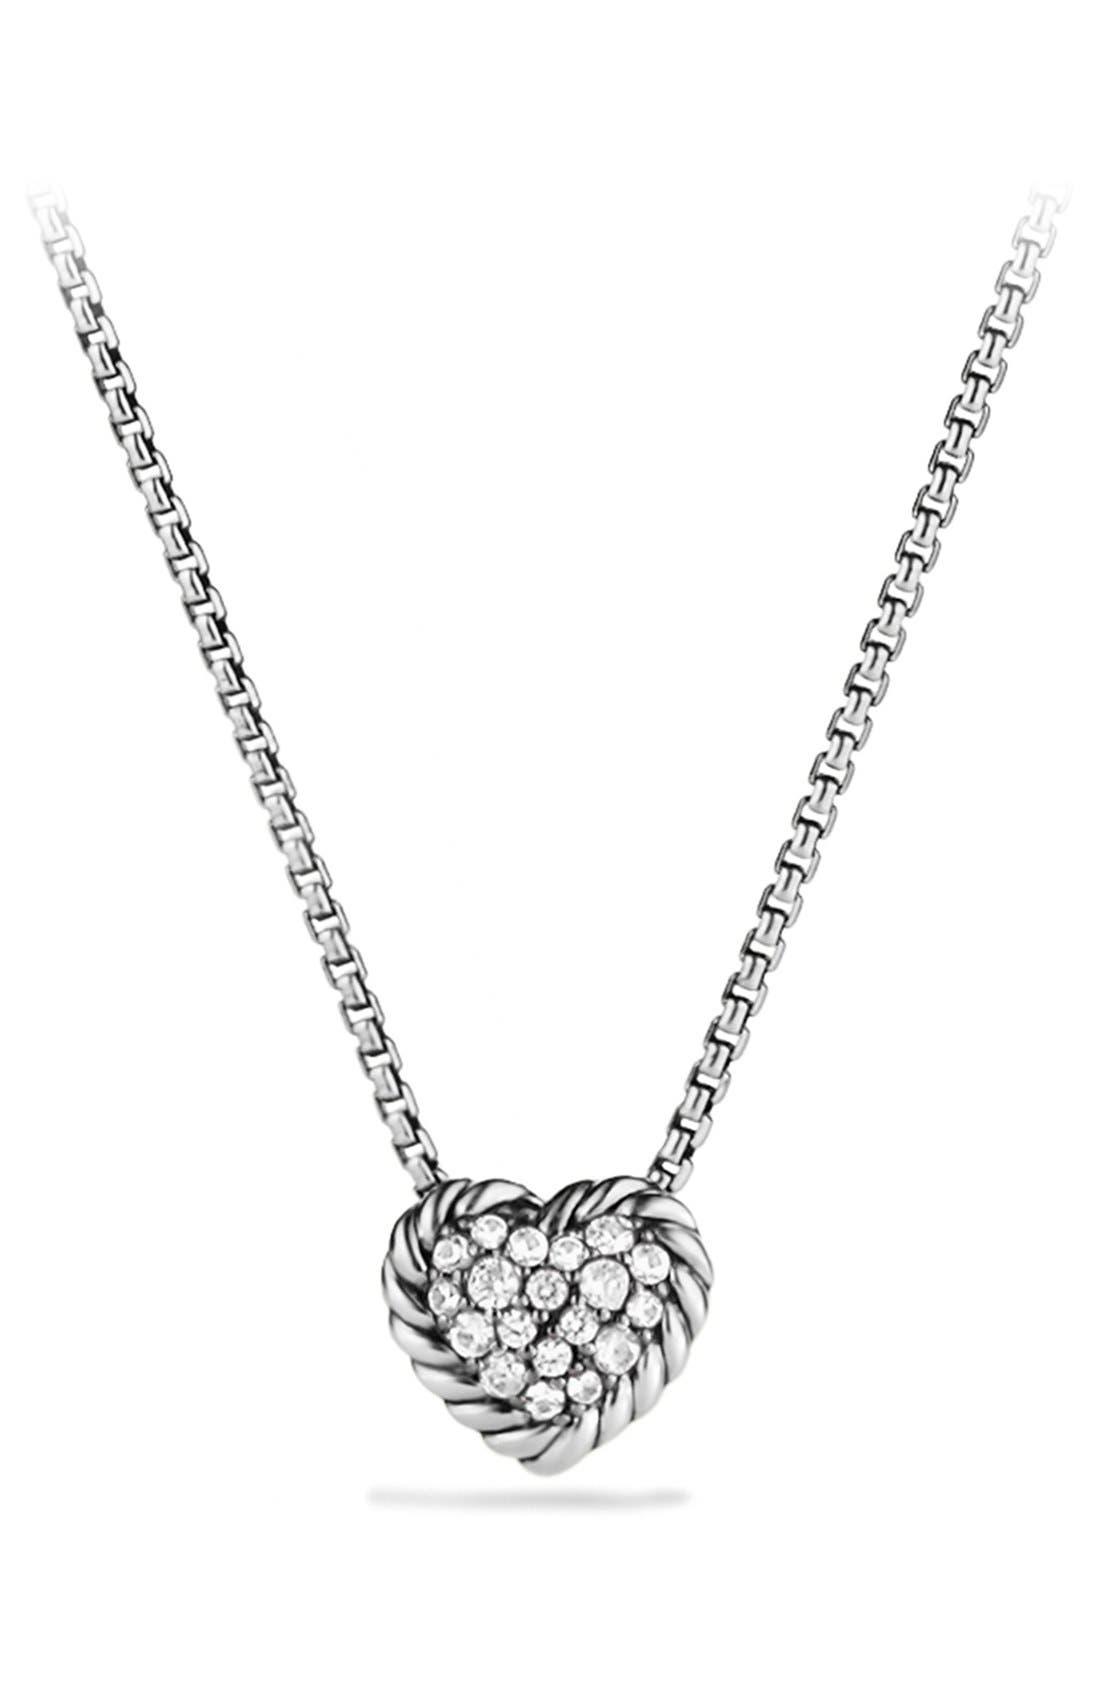 DAVID YURMAN Châtelaine Heart Pendant Necklace with Diamonds